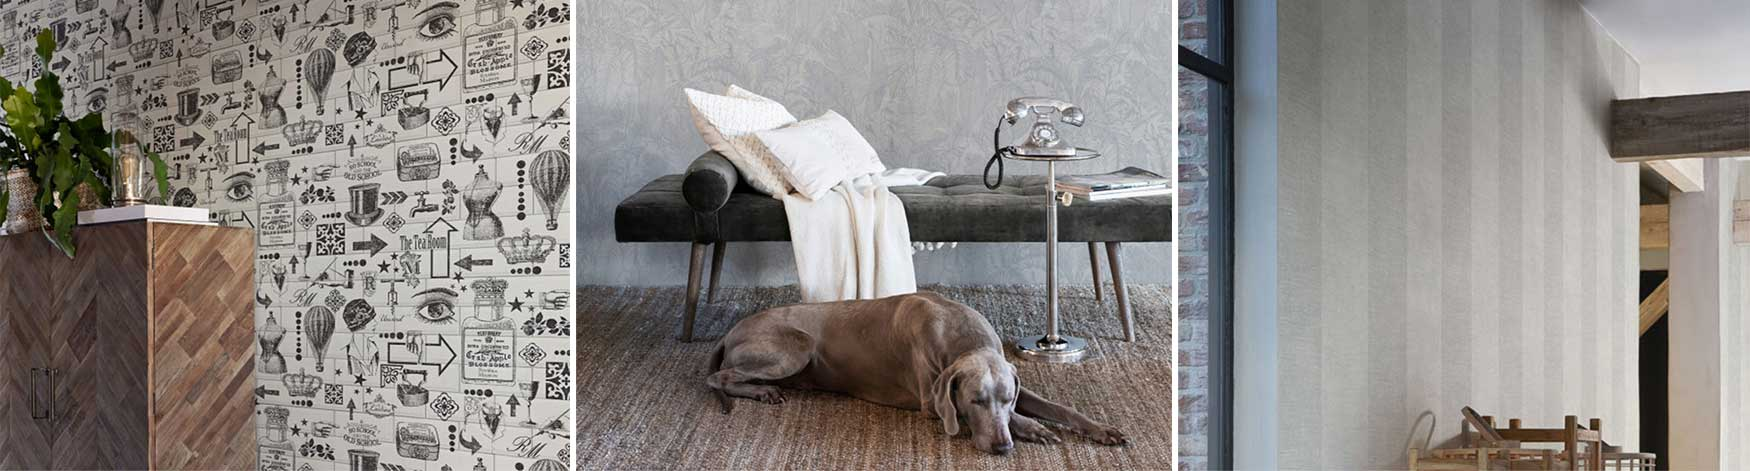 Tapet-Riviera-Maison-II-tapet-lemn-tapet-scandura-tapet-fibra-naturala-tapet-industrial